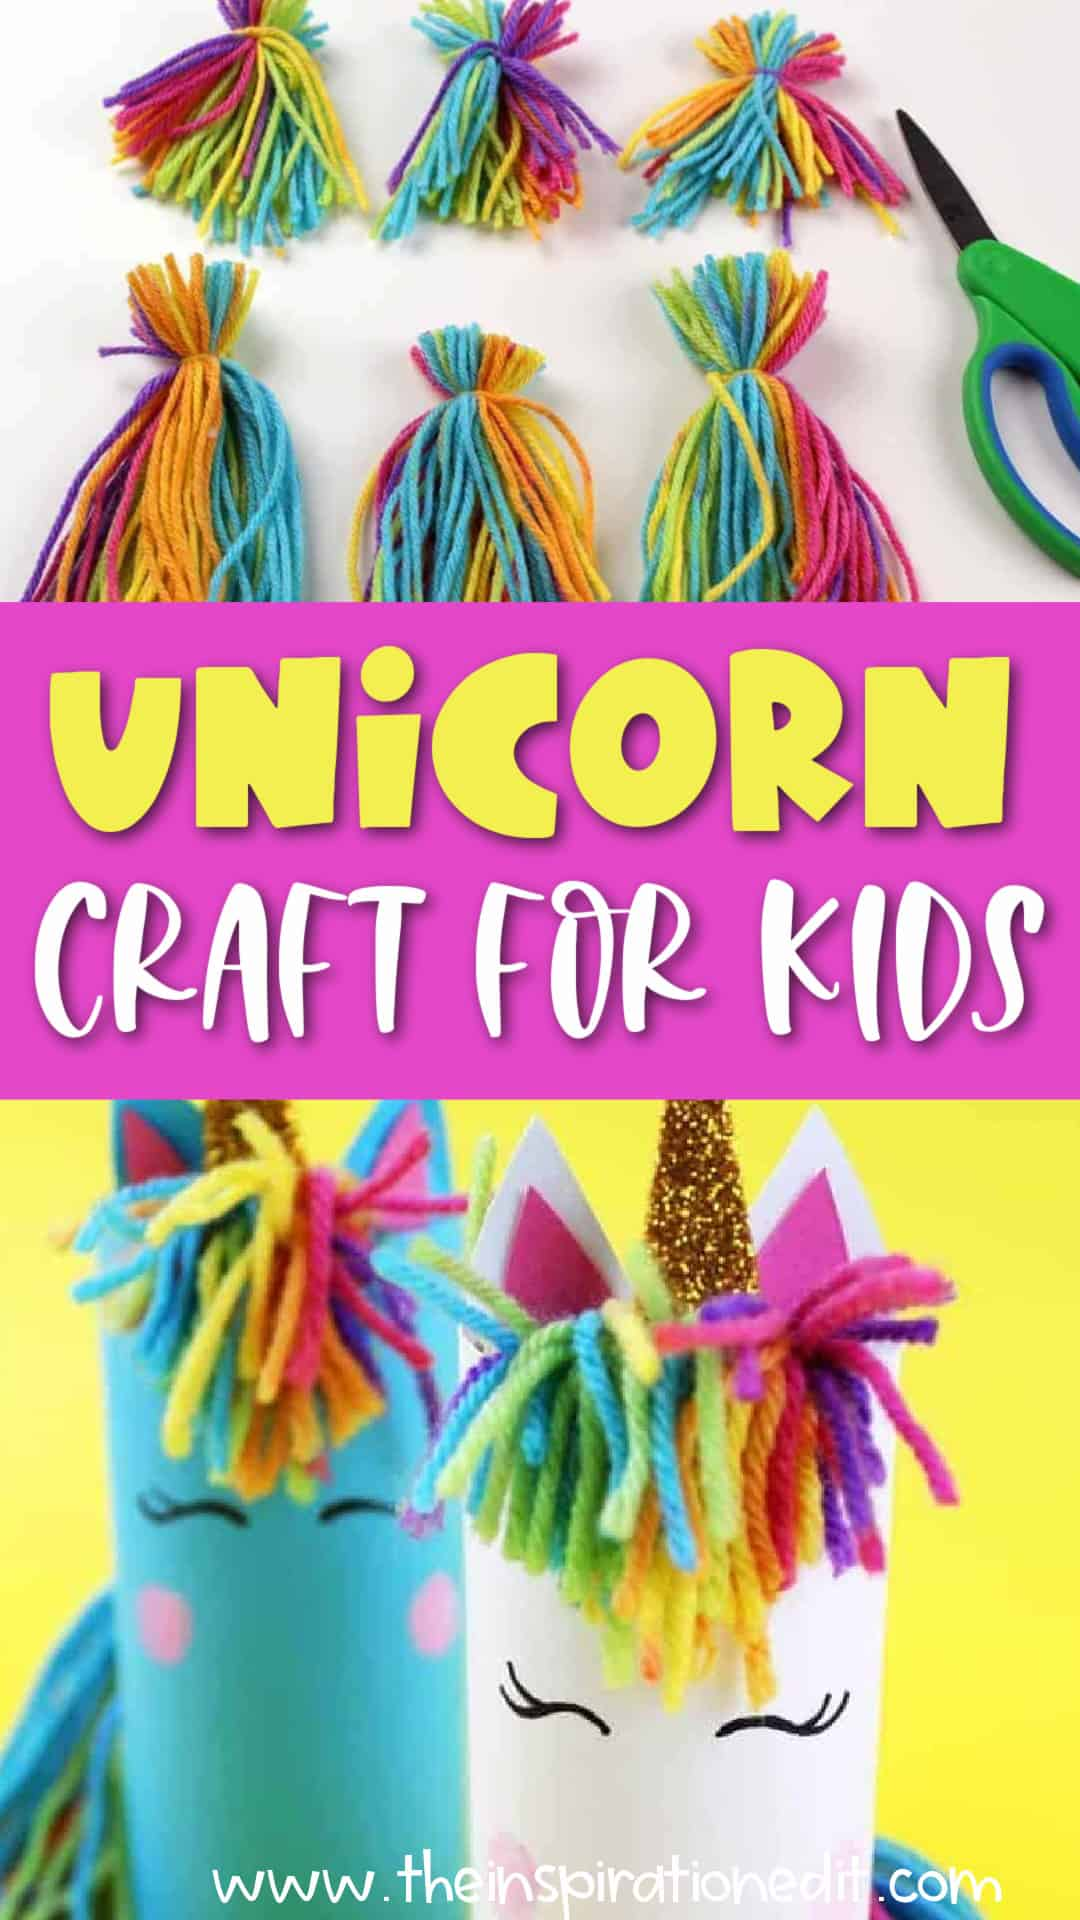 unicorn-craft-for-kids-